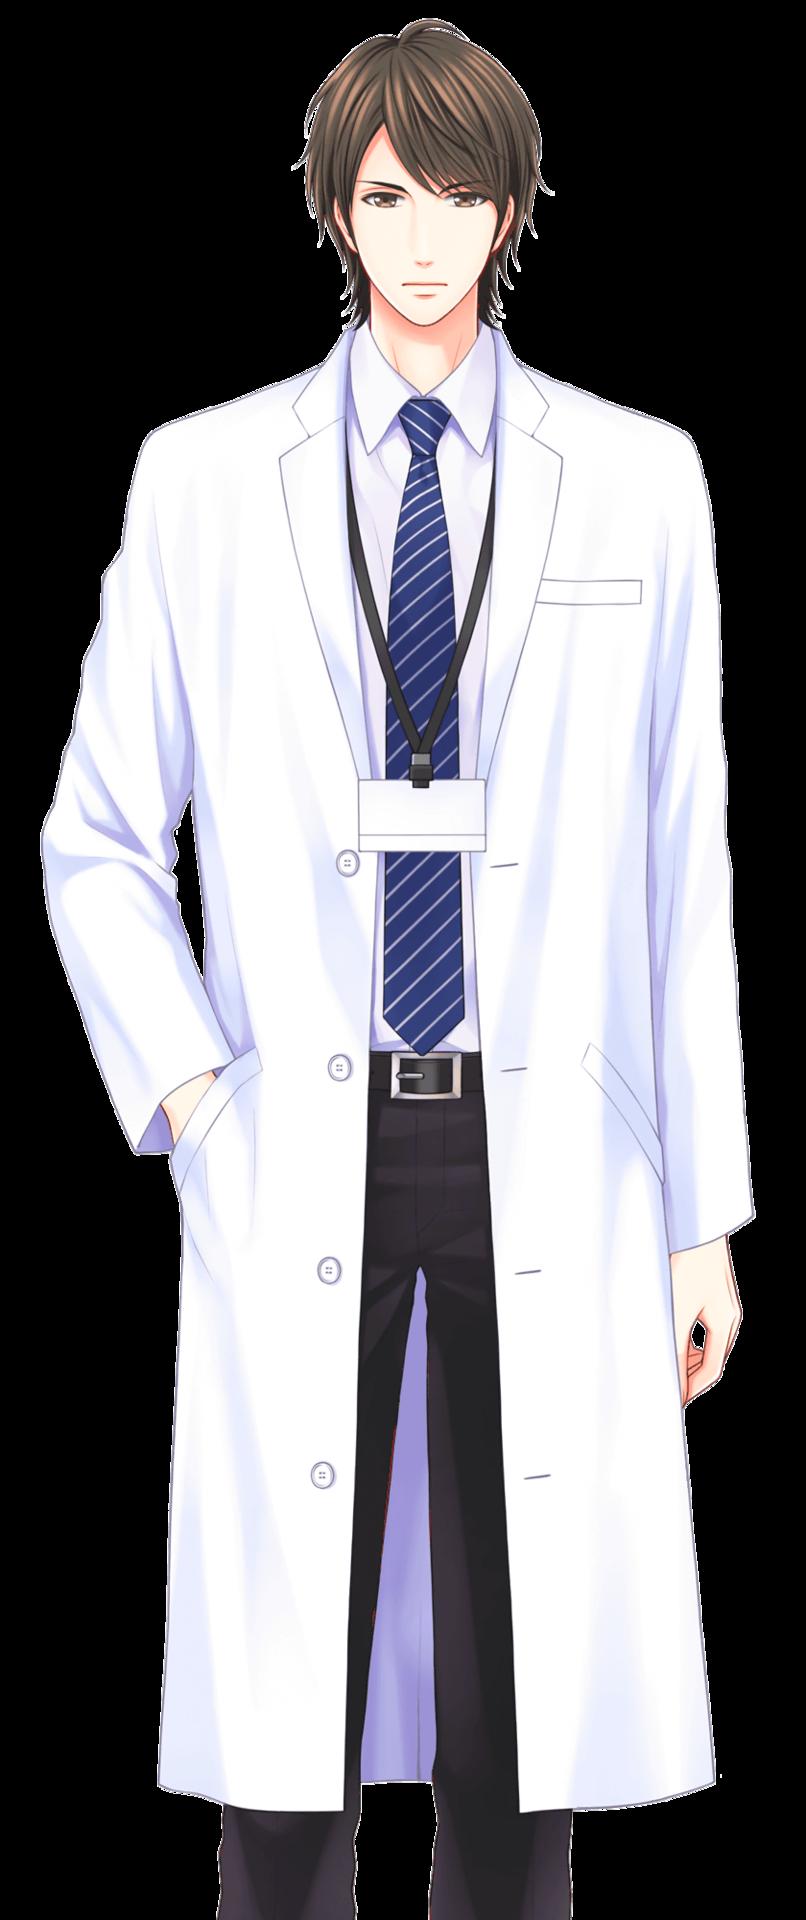 Handsome Doctor Handsome anime guys, Handsome anime, Anime